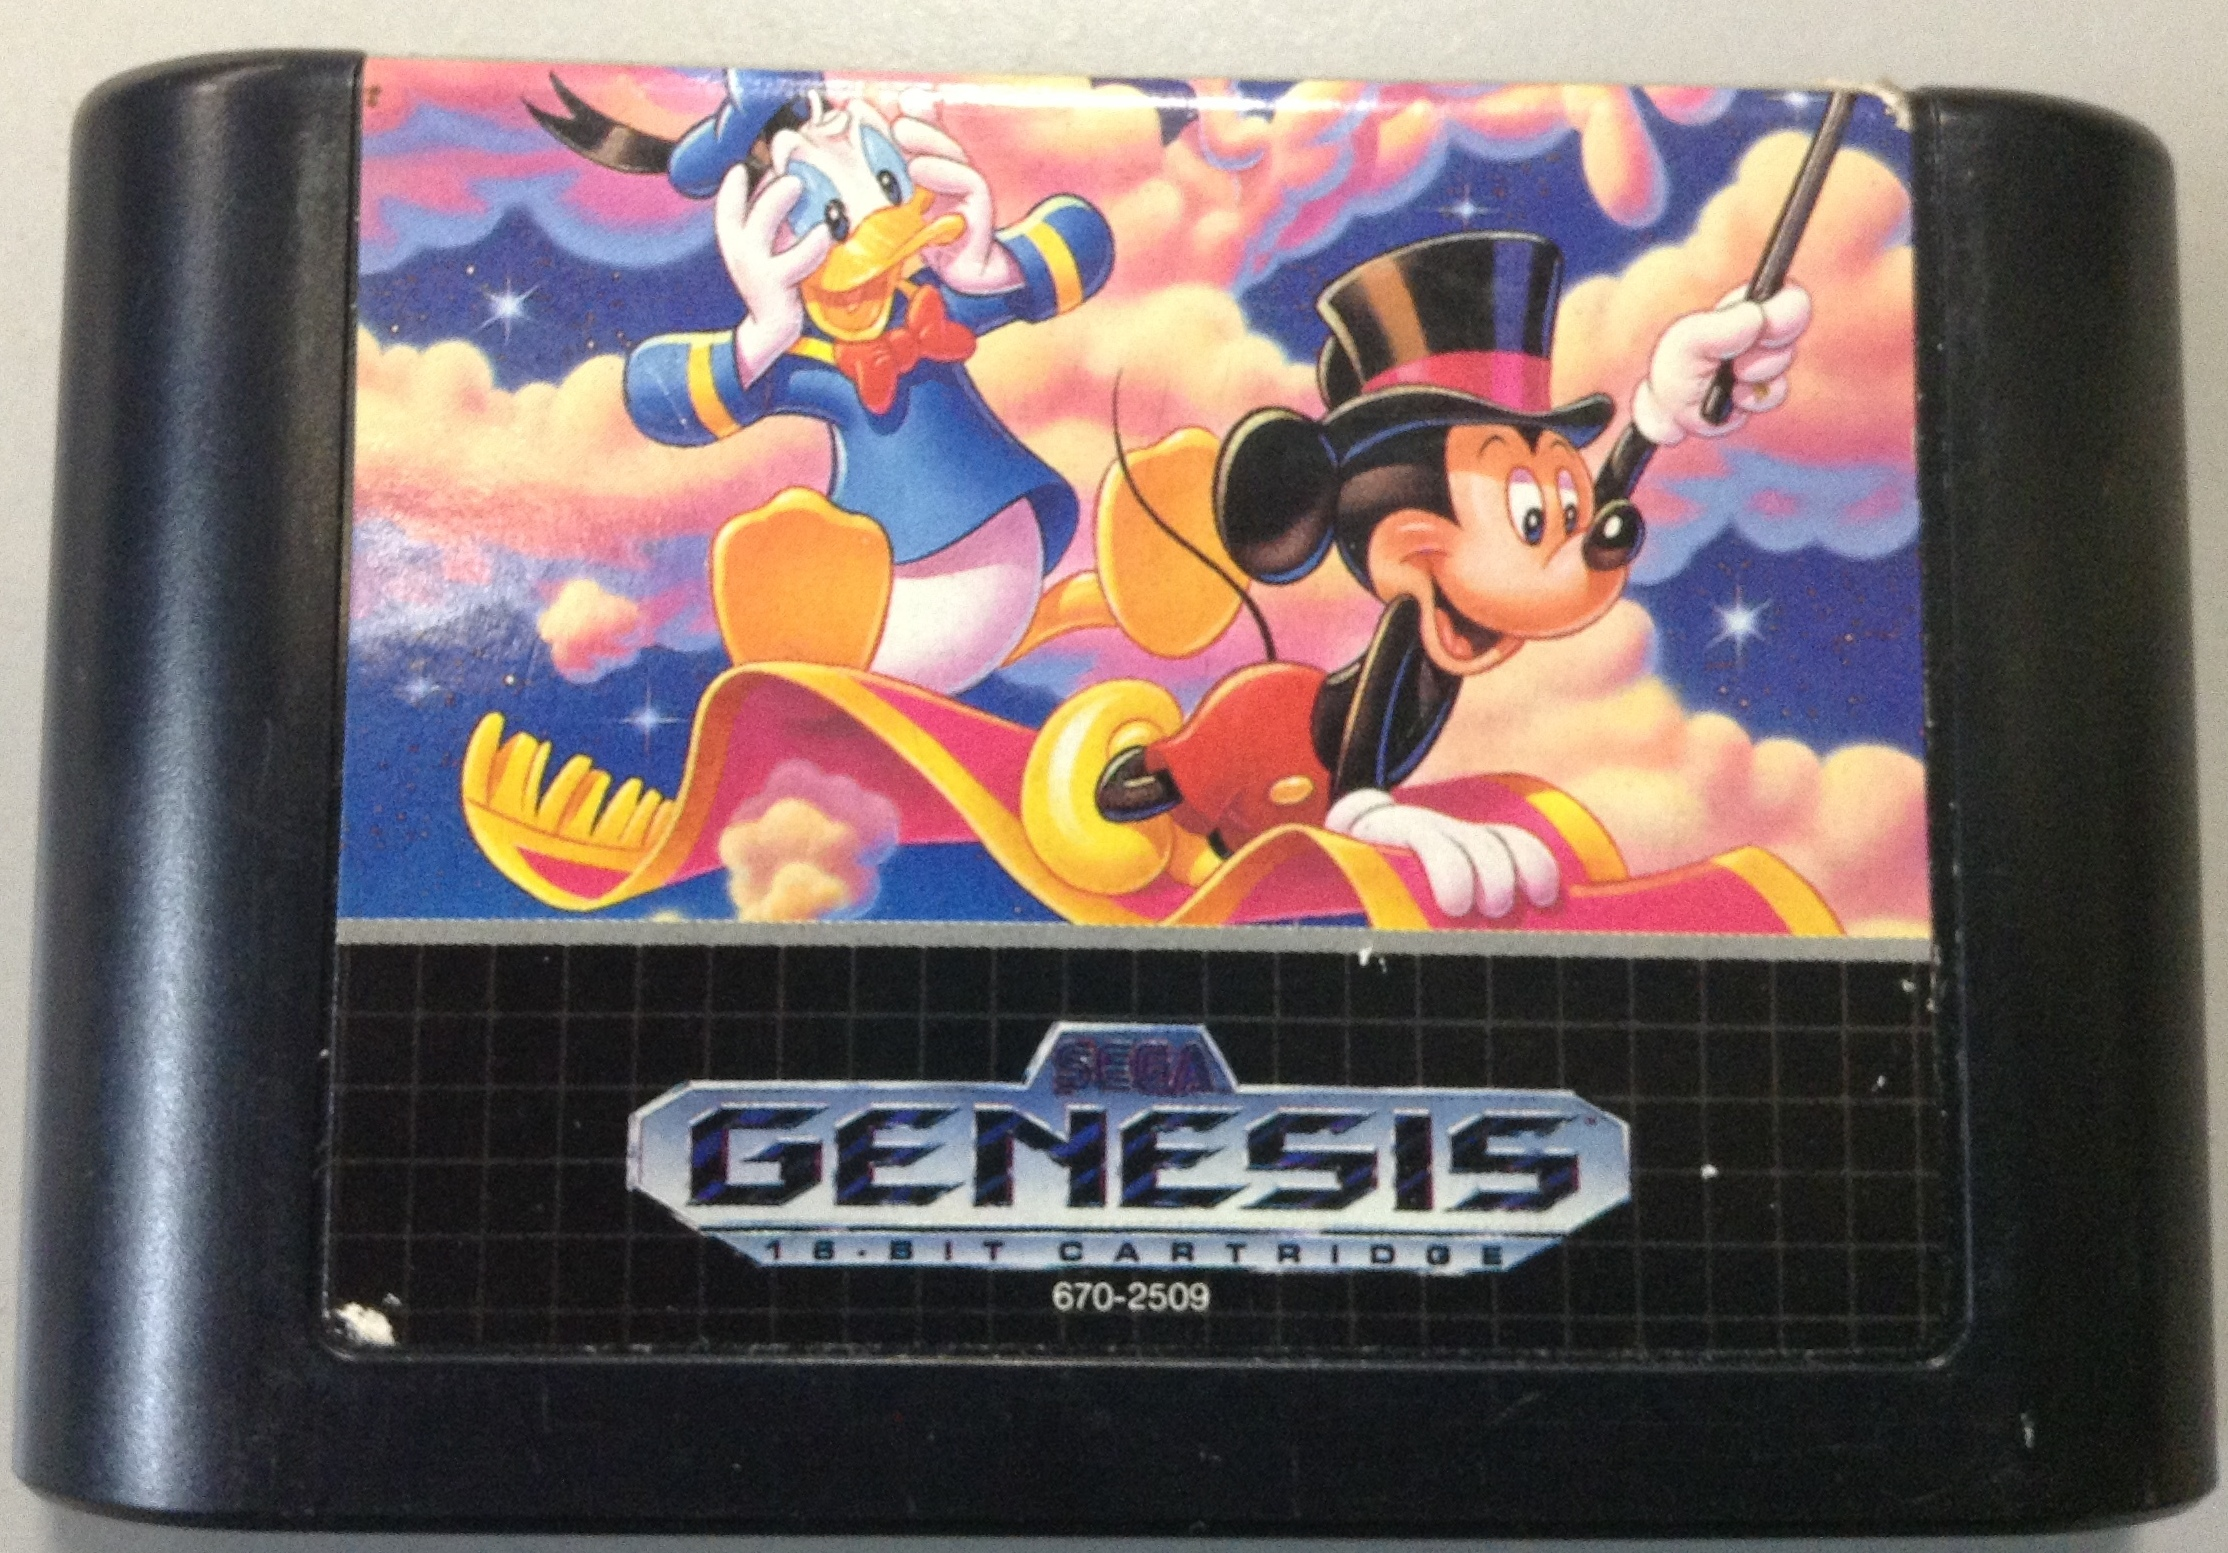 WORLD OF ILLUSION- SEGA GENESIS GAME SYSTEMS